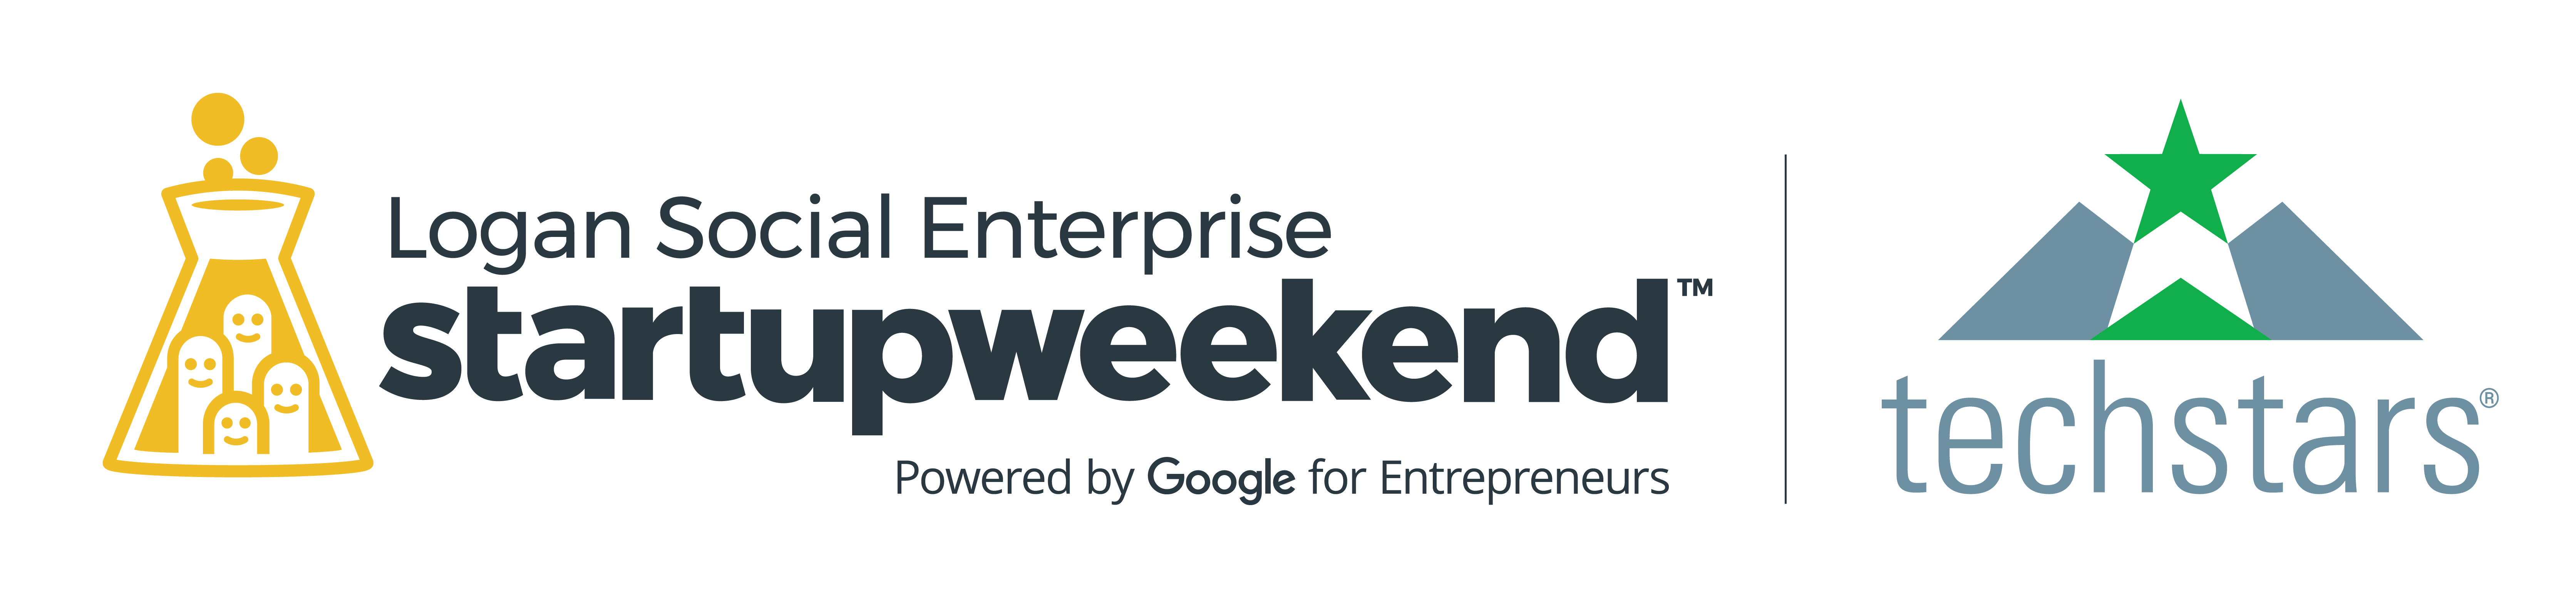 New Startup Weekend Logo 2017